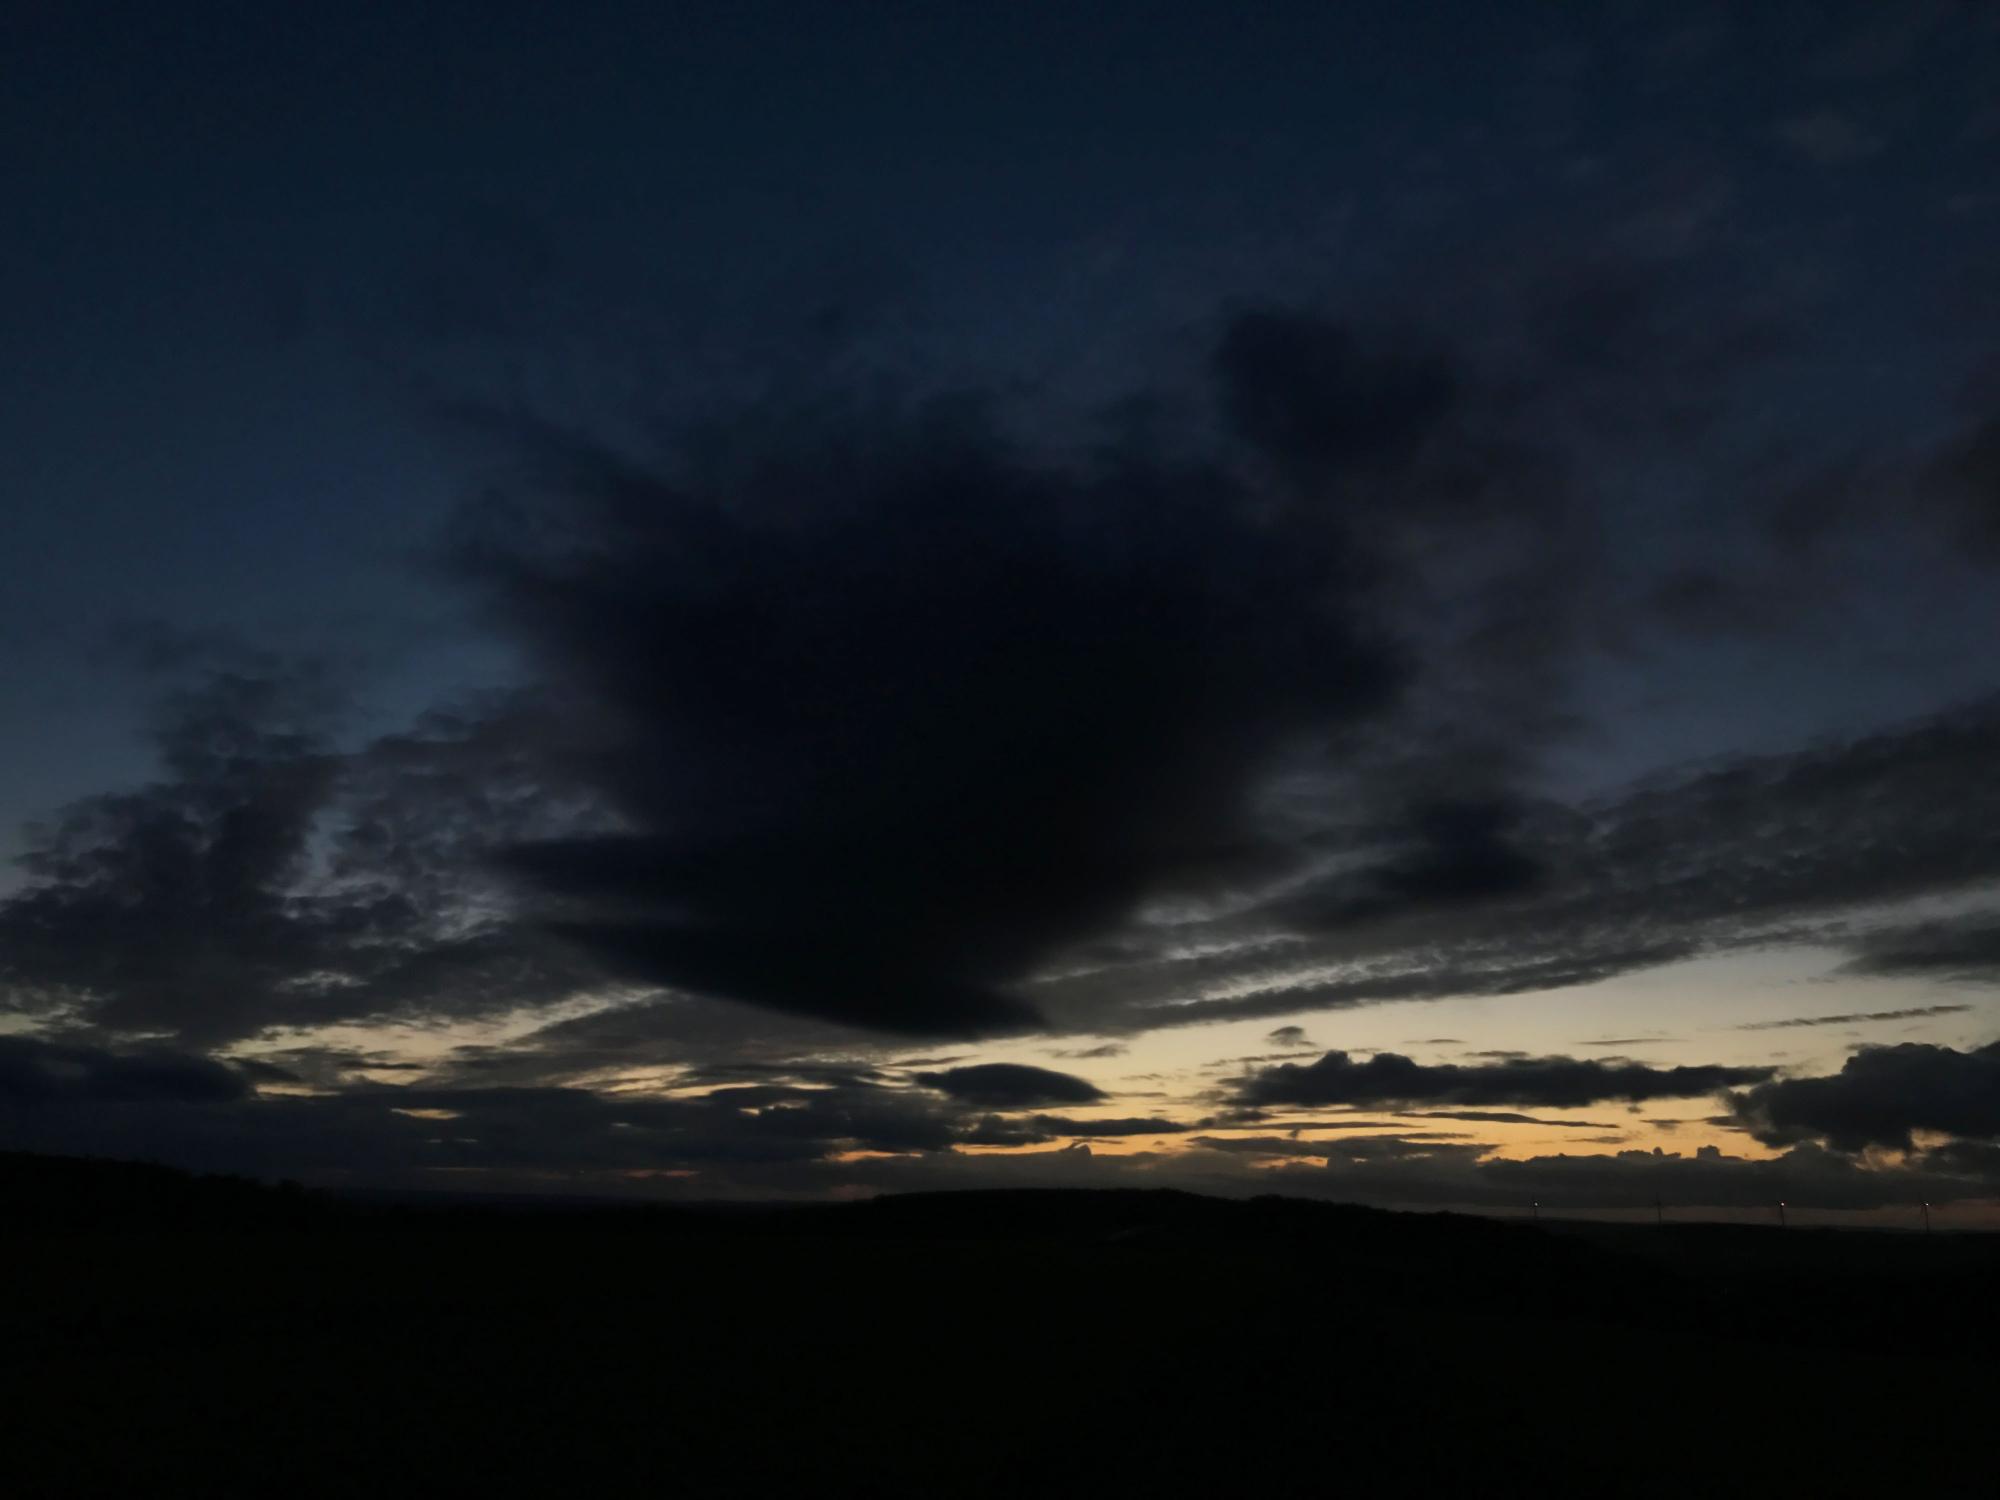 conjonction nuages 7788B1N1 send.jpg